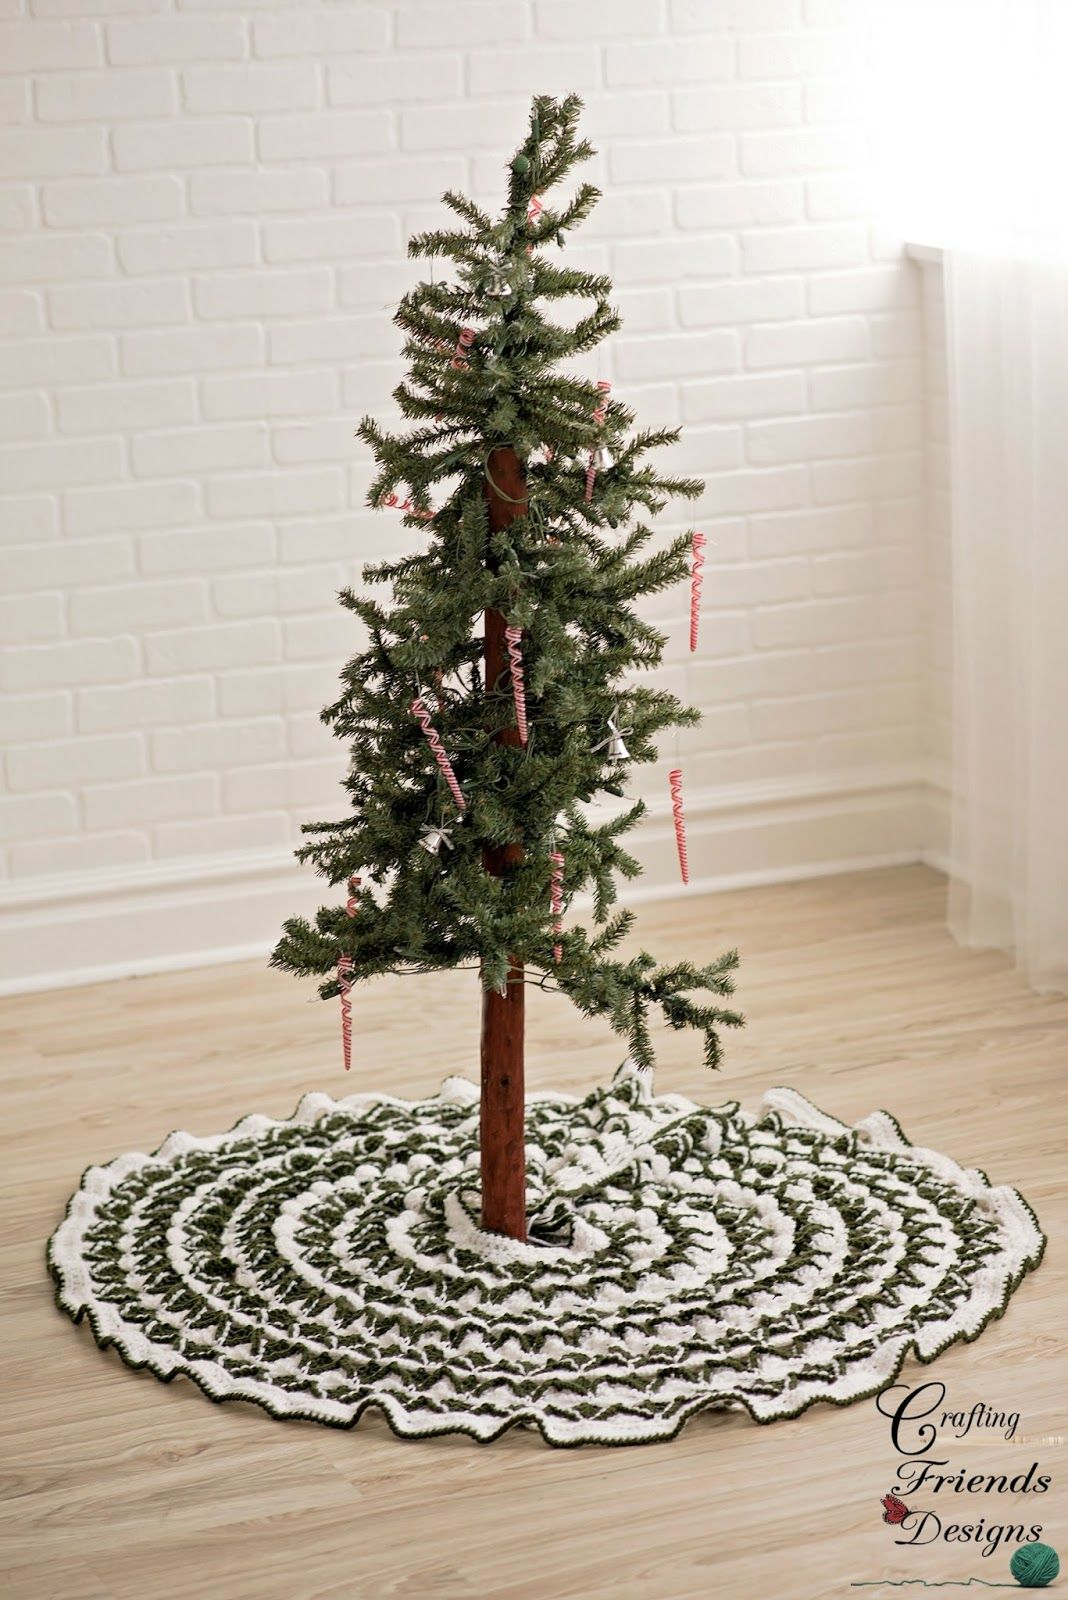 Crafting Friends Designs: Christmas Pine Tree Skirt Free Crochet ...